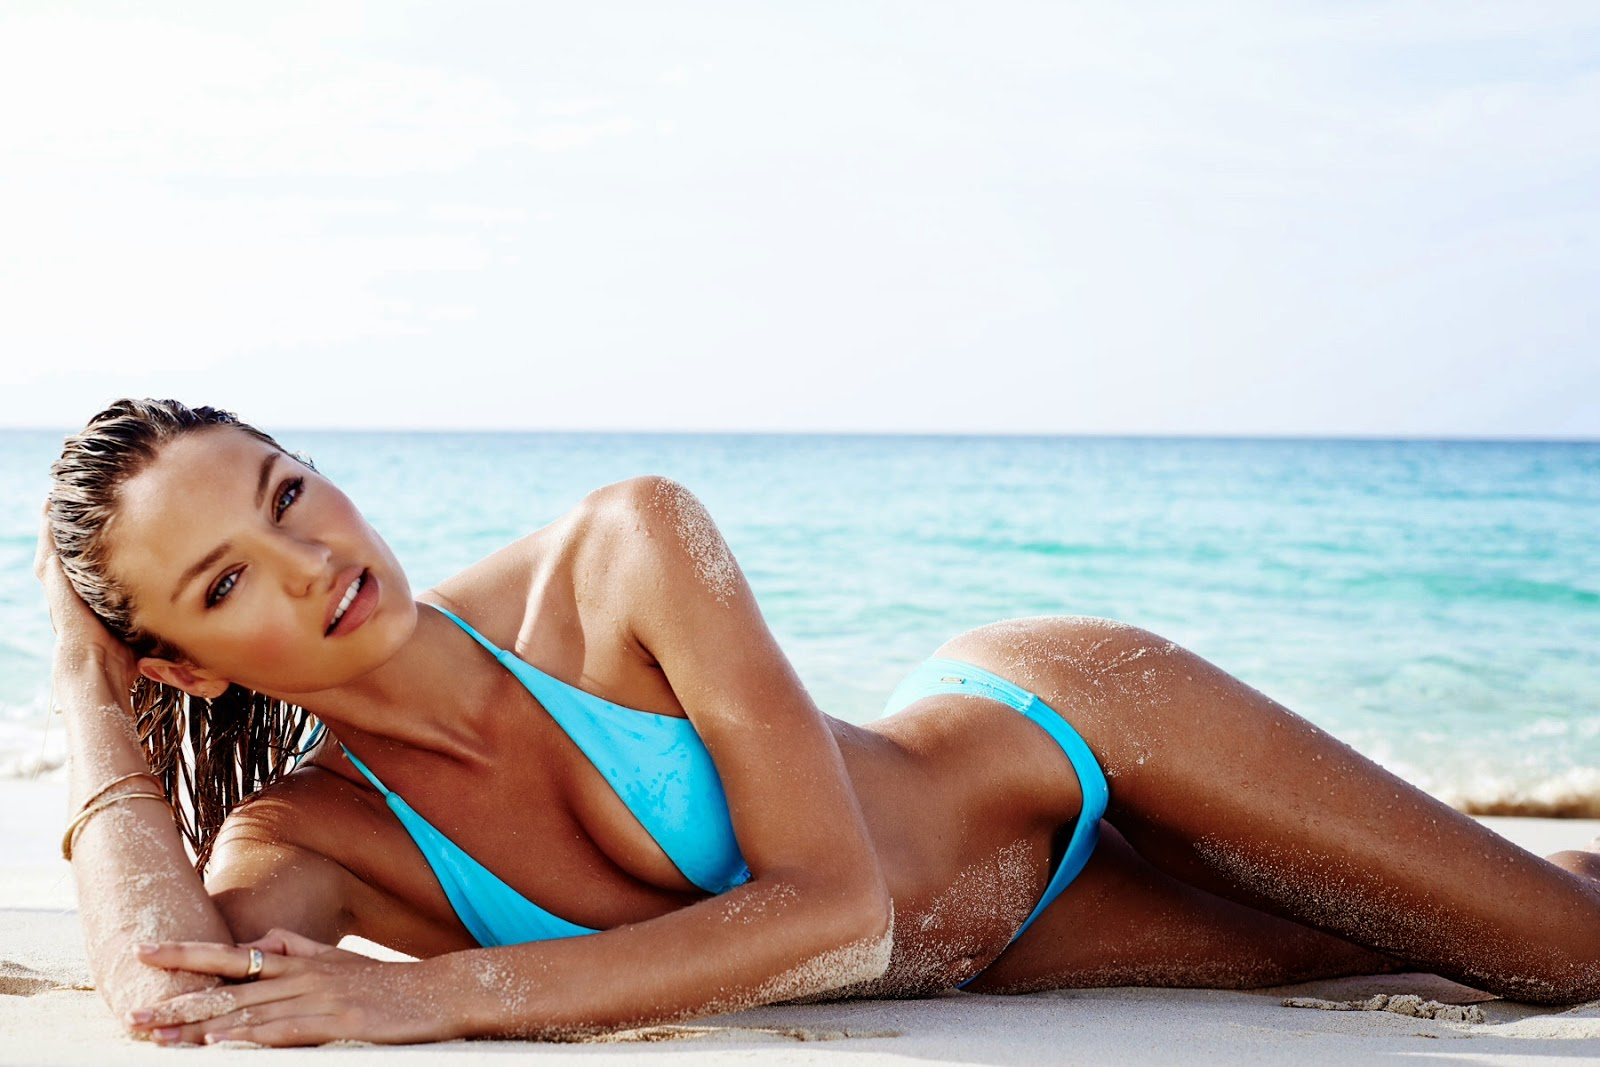 Candice-Swanepoel-Paola-Murray-Swimwear-2.jpg